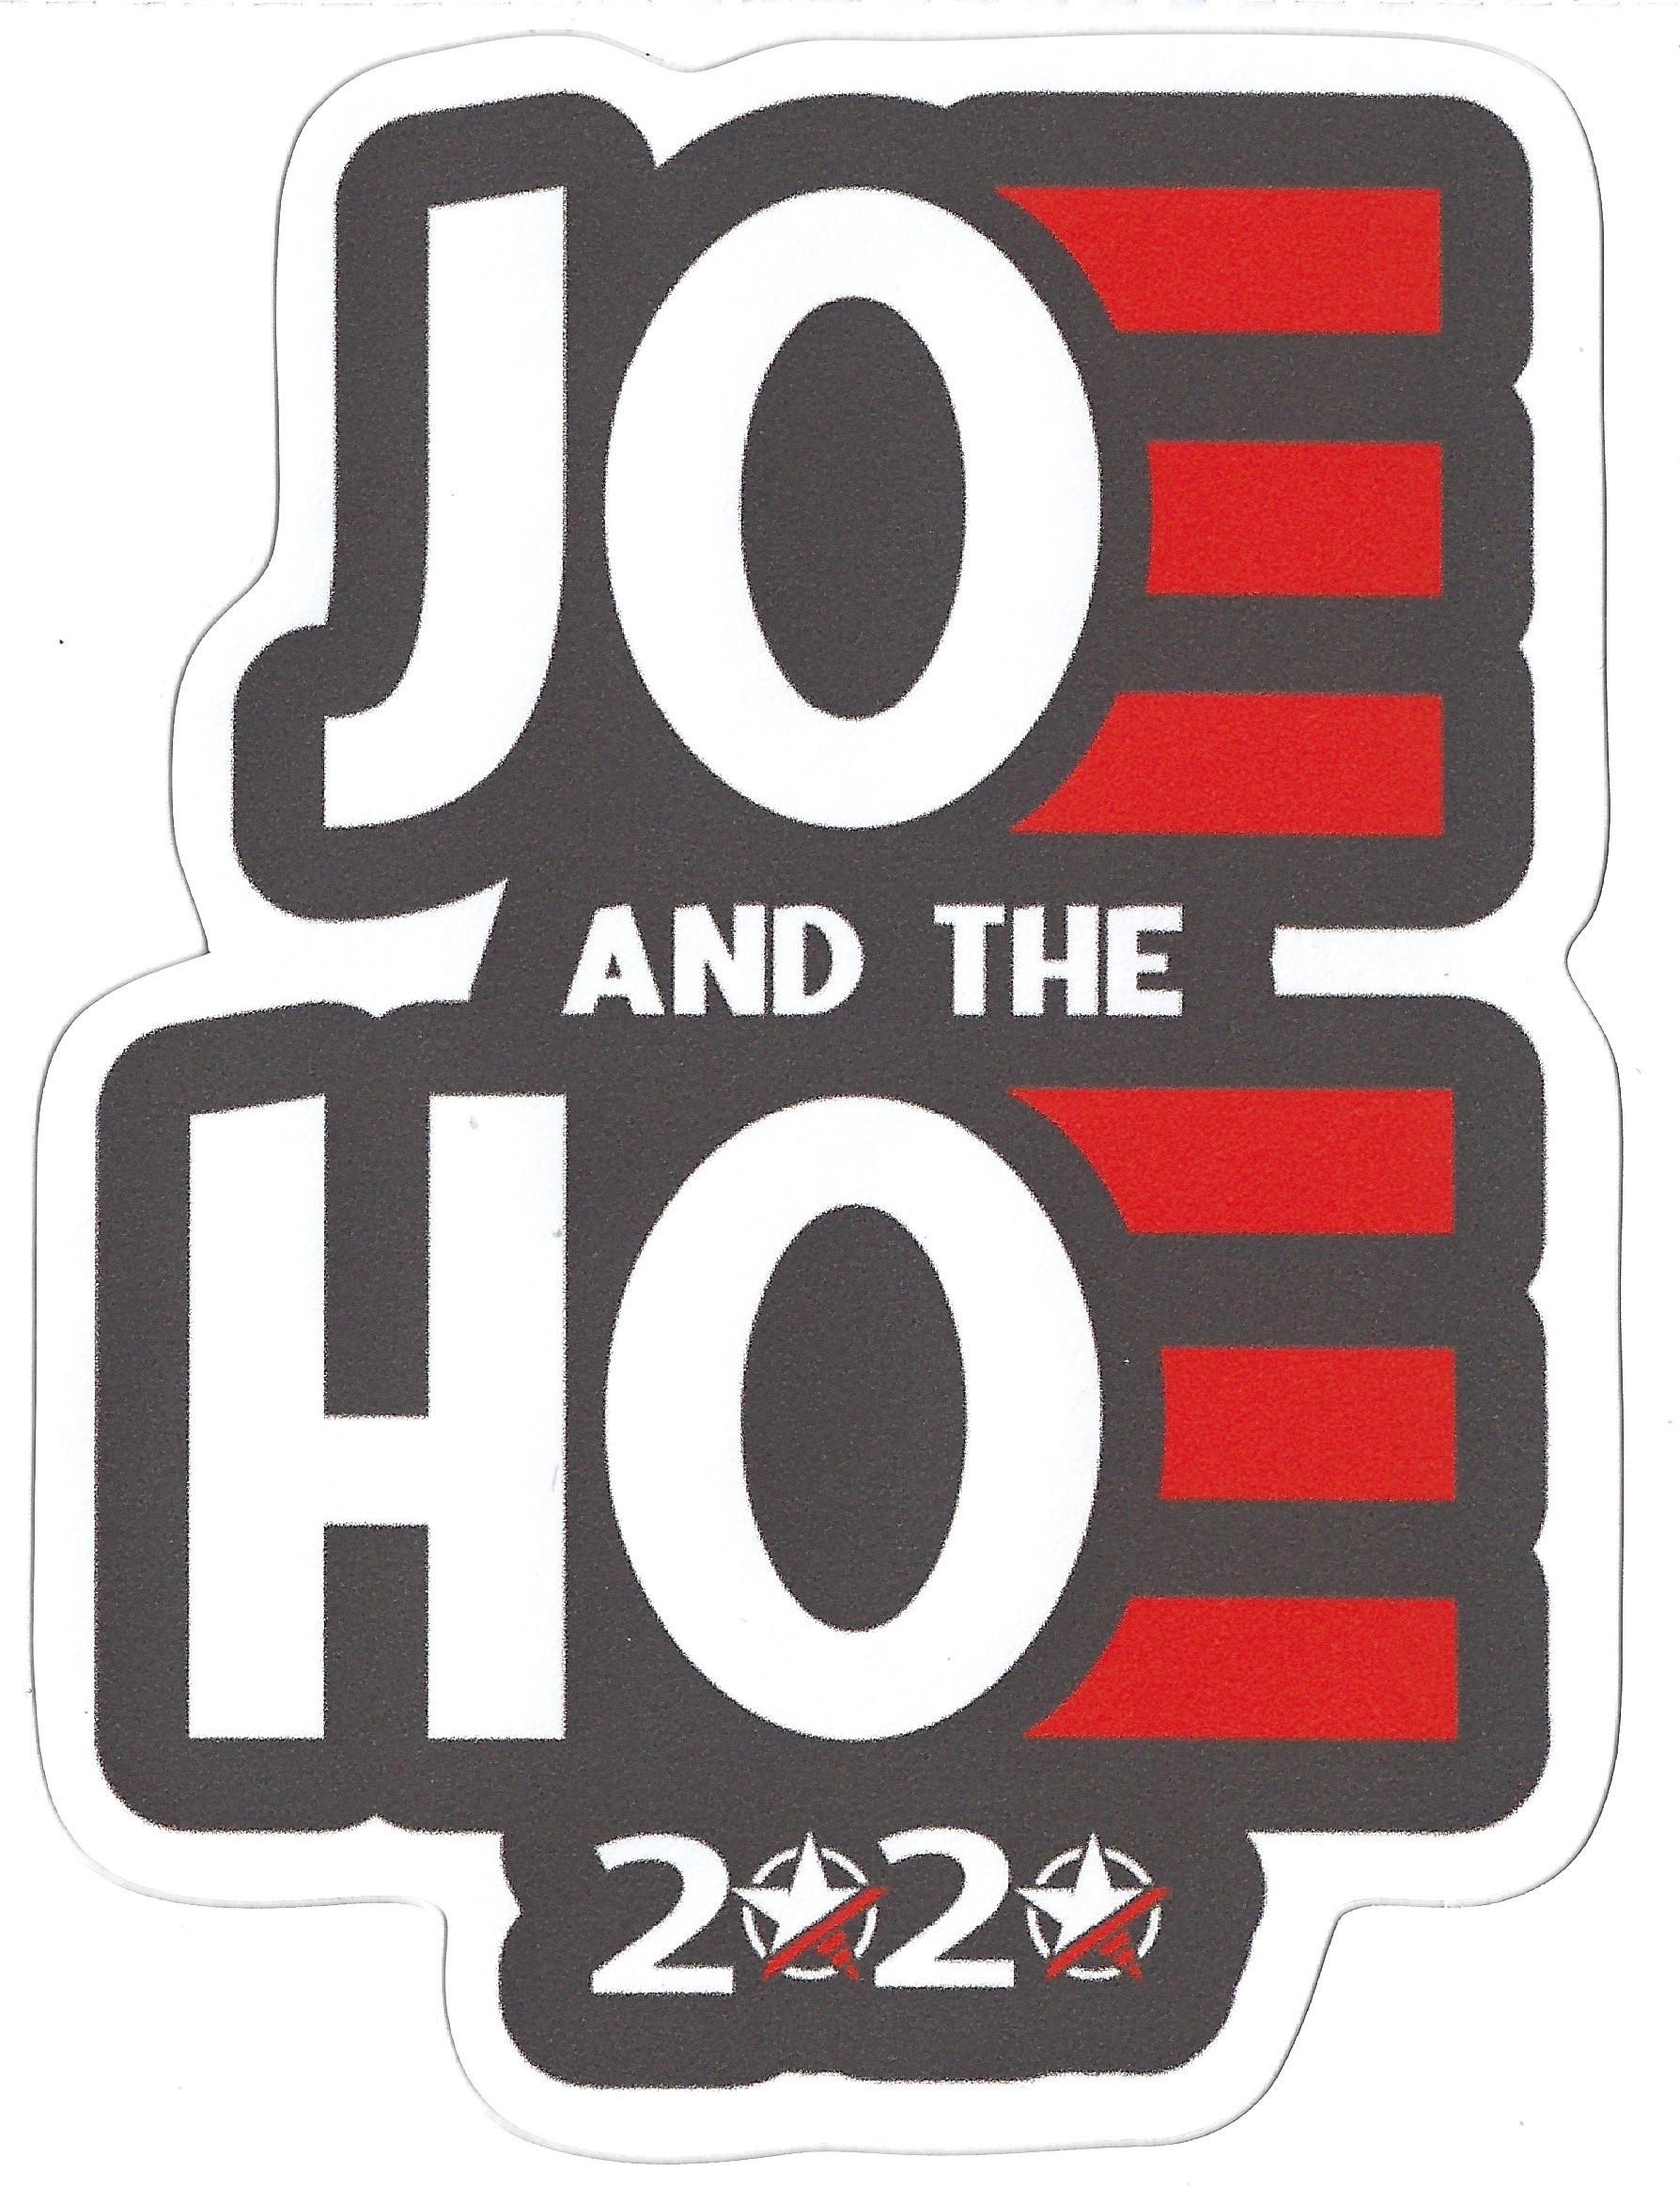 Joe and the Hoe 2020